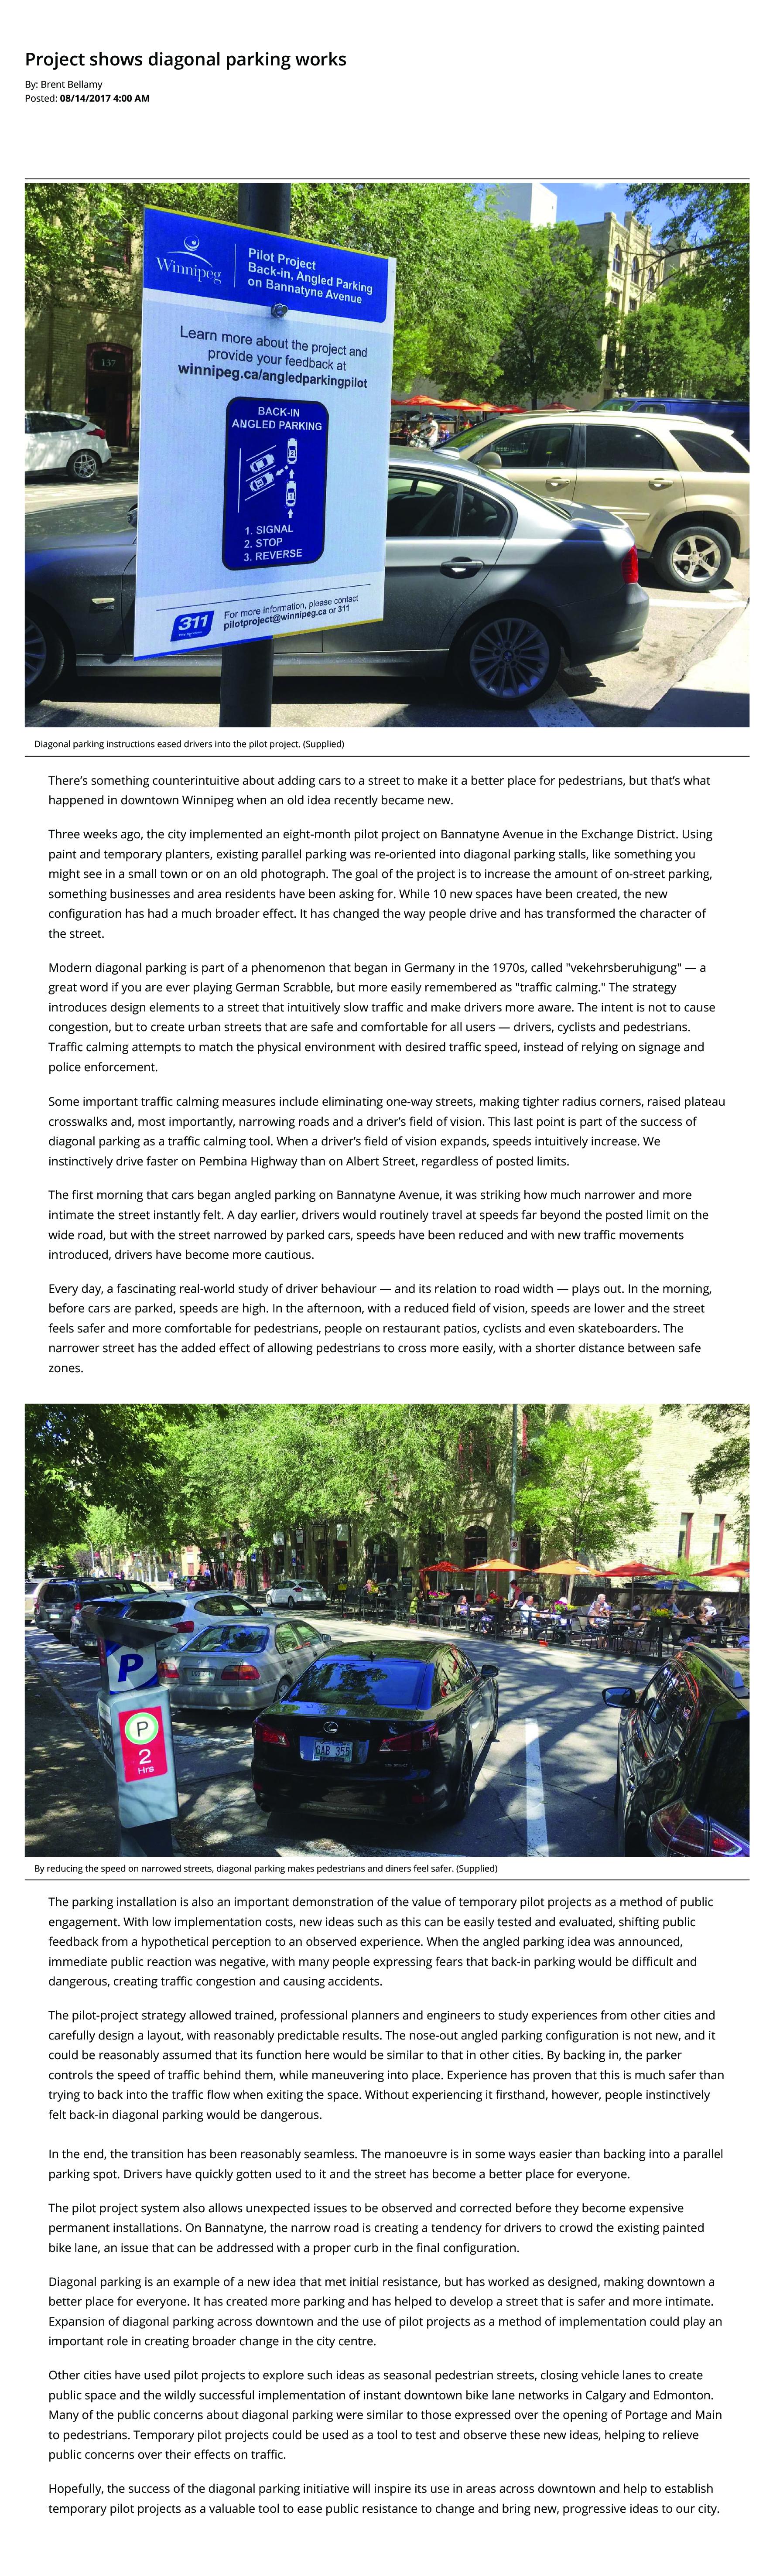 Project shows diagonal parking works - Winnipeg Free Press-1.jpg